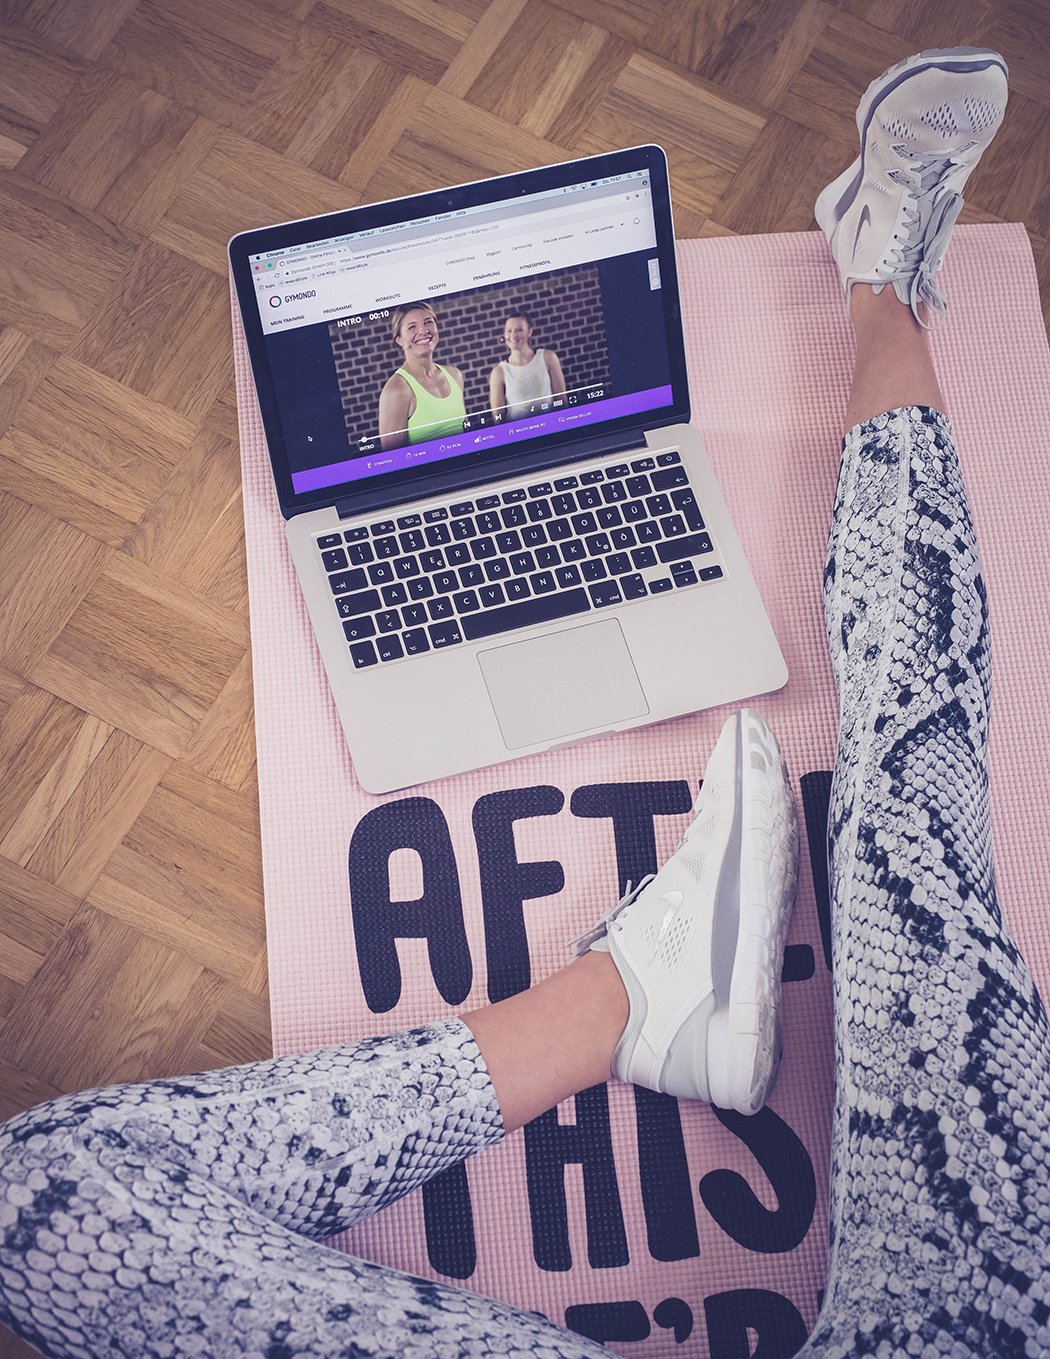 Fitnessblog-Fitnessblogger-Fitness-Blog-Blogger-Gymondo-Gutschein-Rabatt-Discount-Lindarella-Hometraining-Homeworkout-20-web